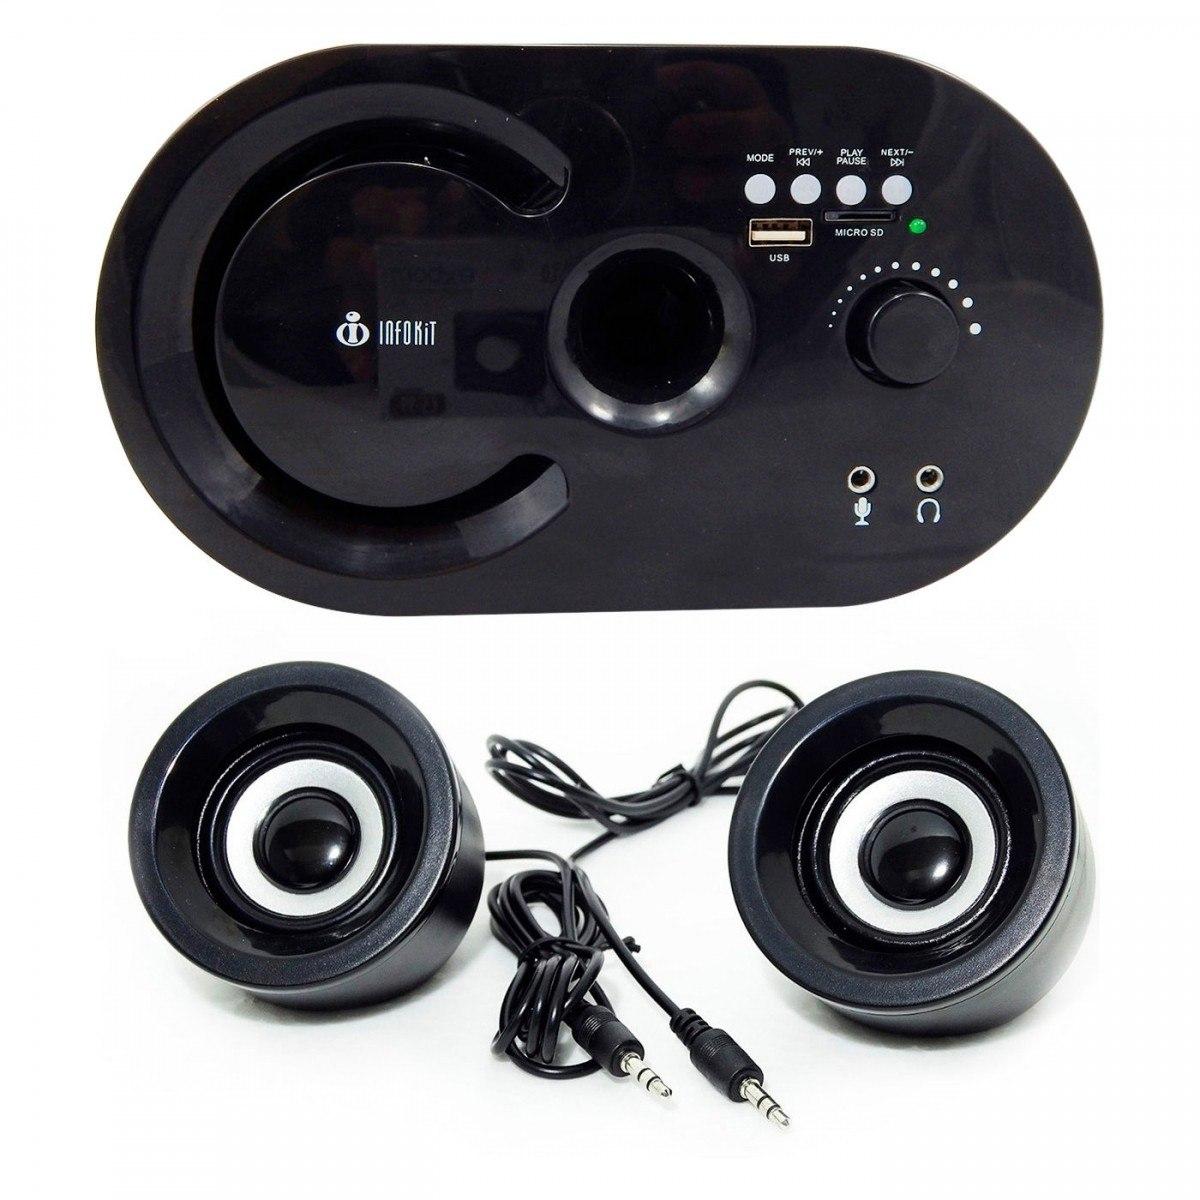 Caixa De Som 2.1 Bluetooth Radio Fm Rca Pc Notebook Tv Usb Infokit